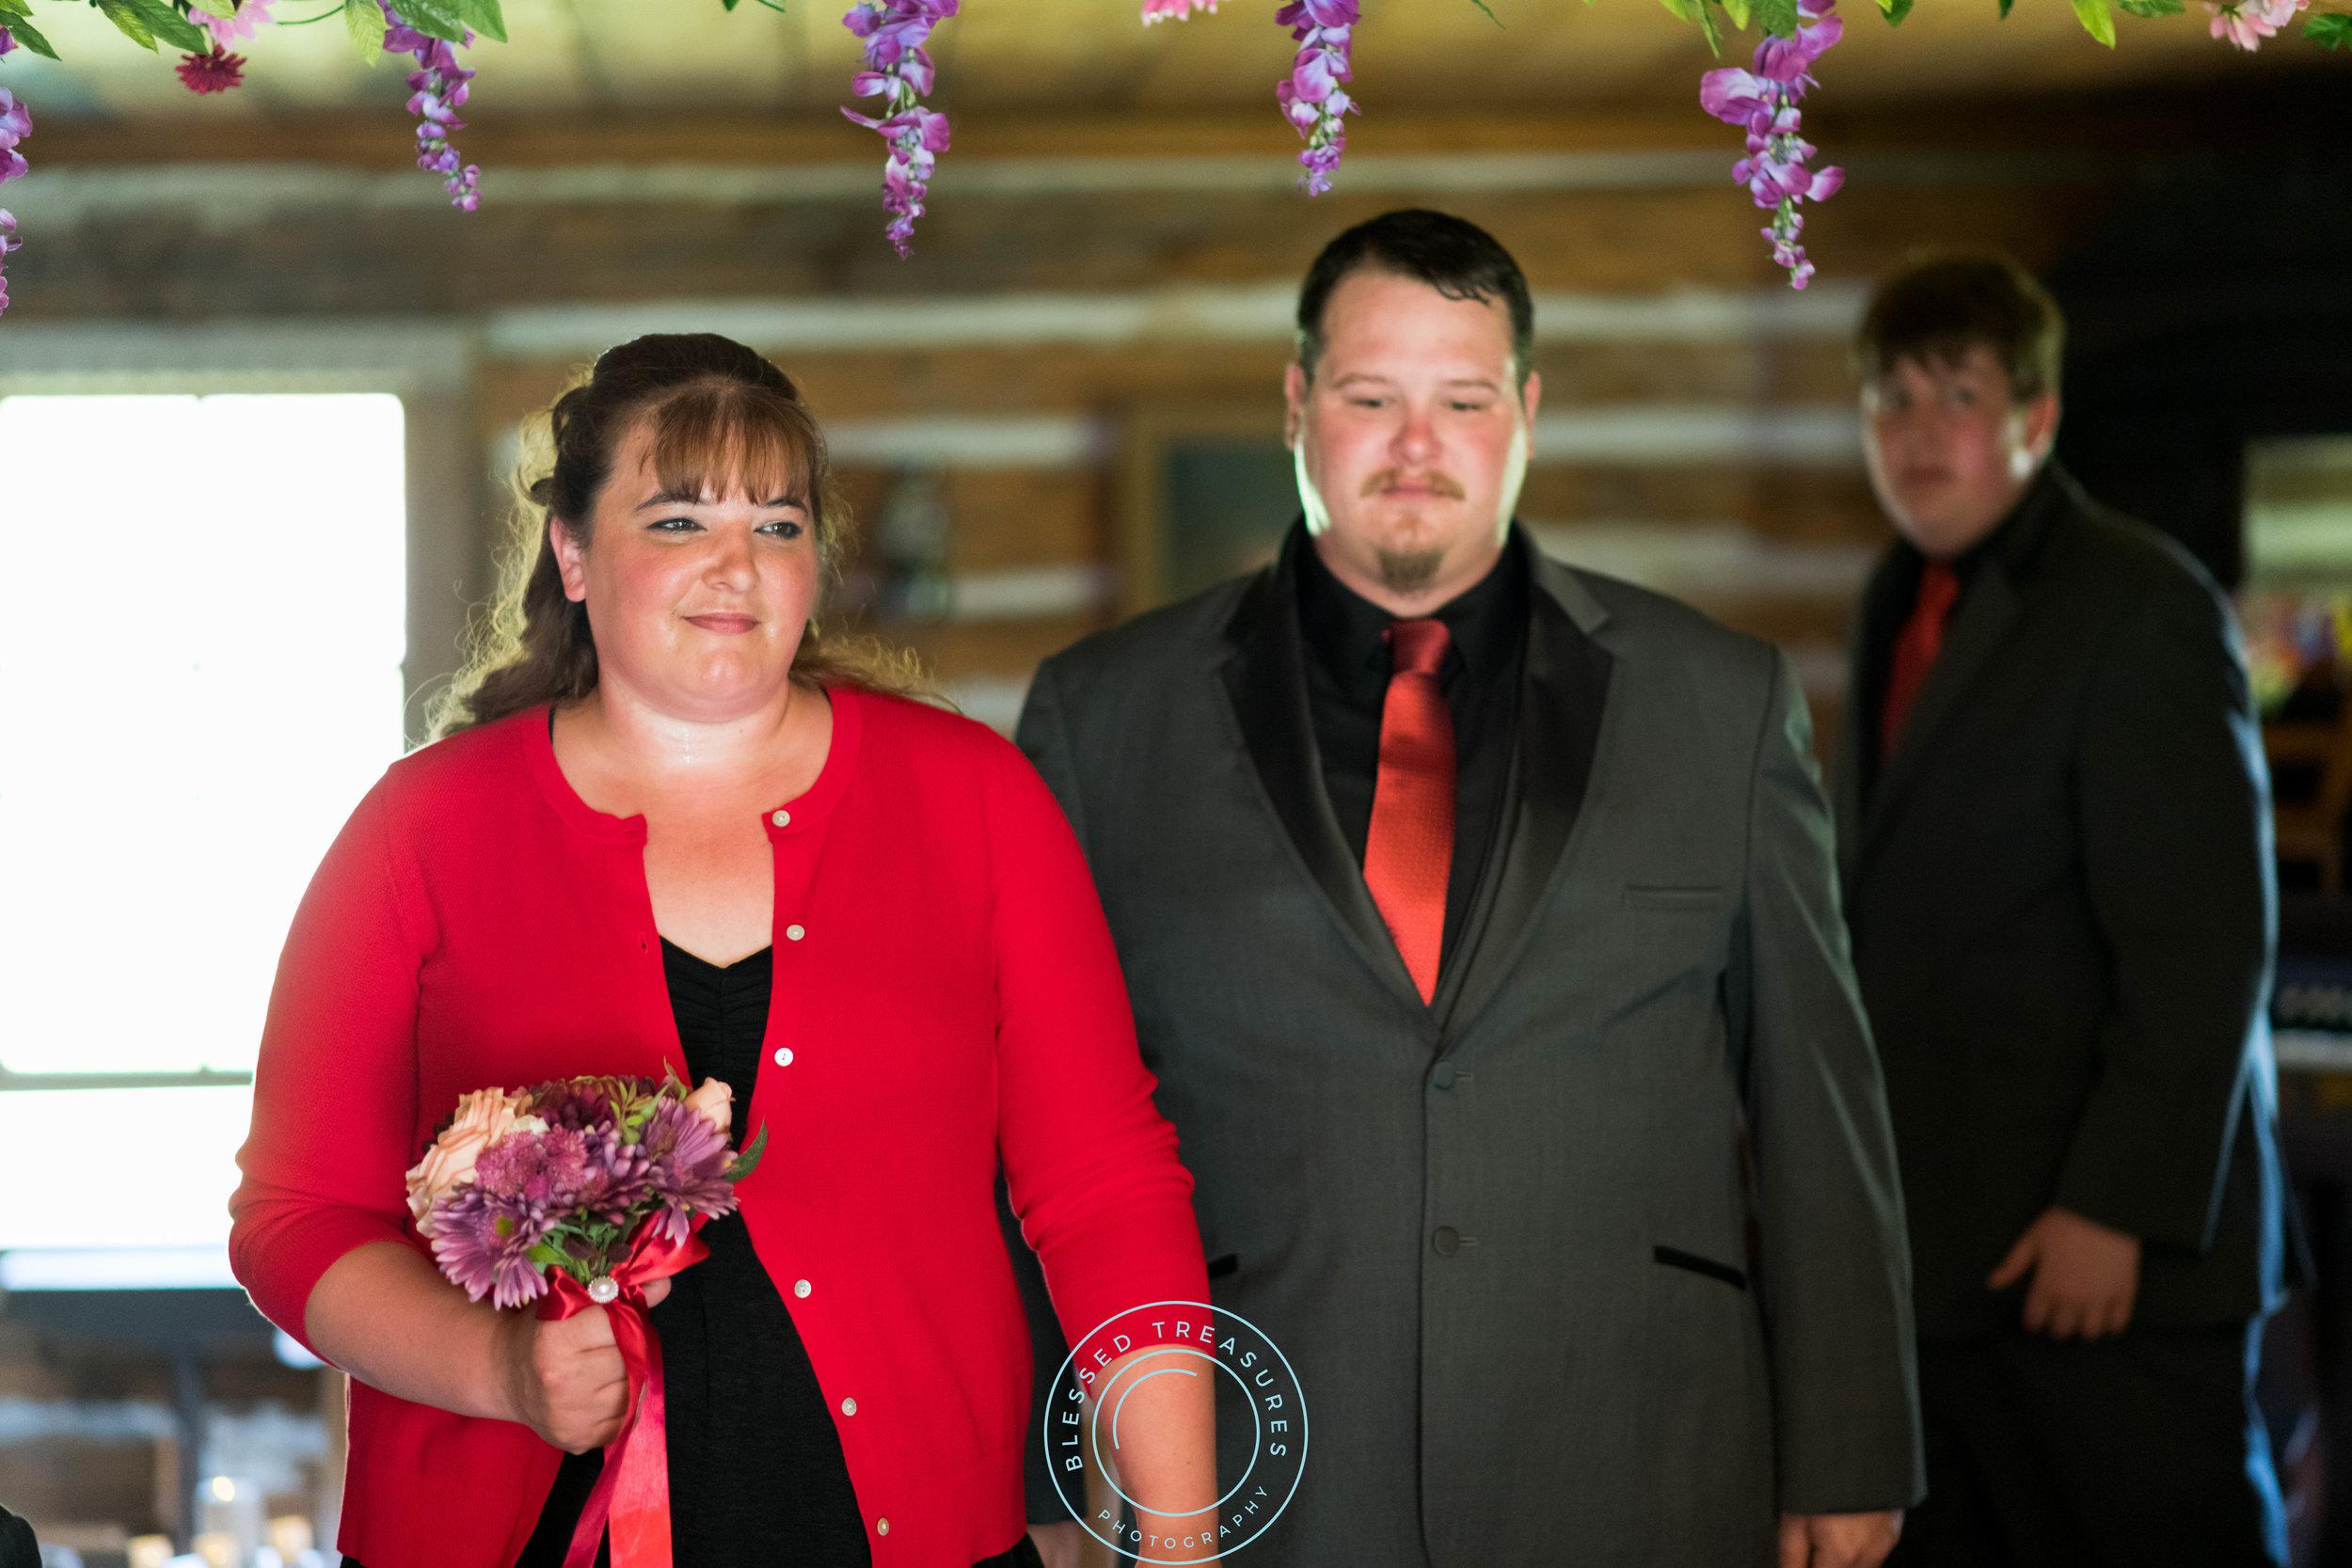 Mansfield township pioneer church crystal falls michigan bride and groom wedding ceremony